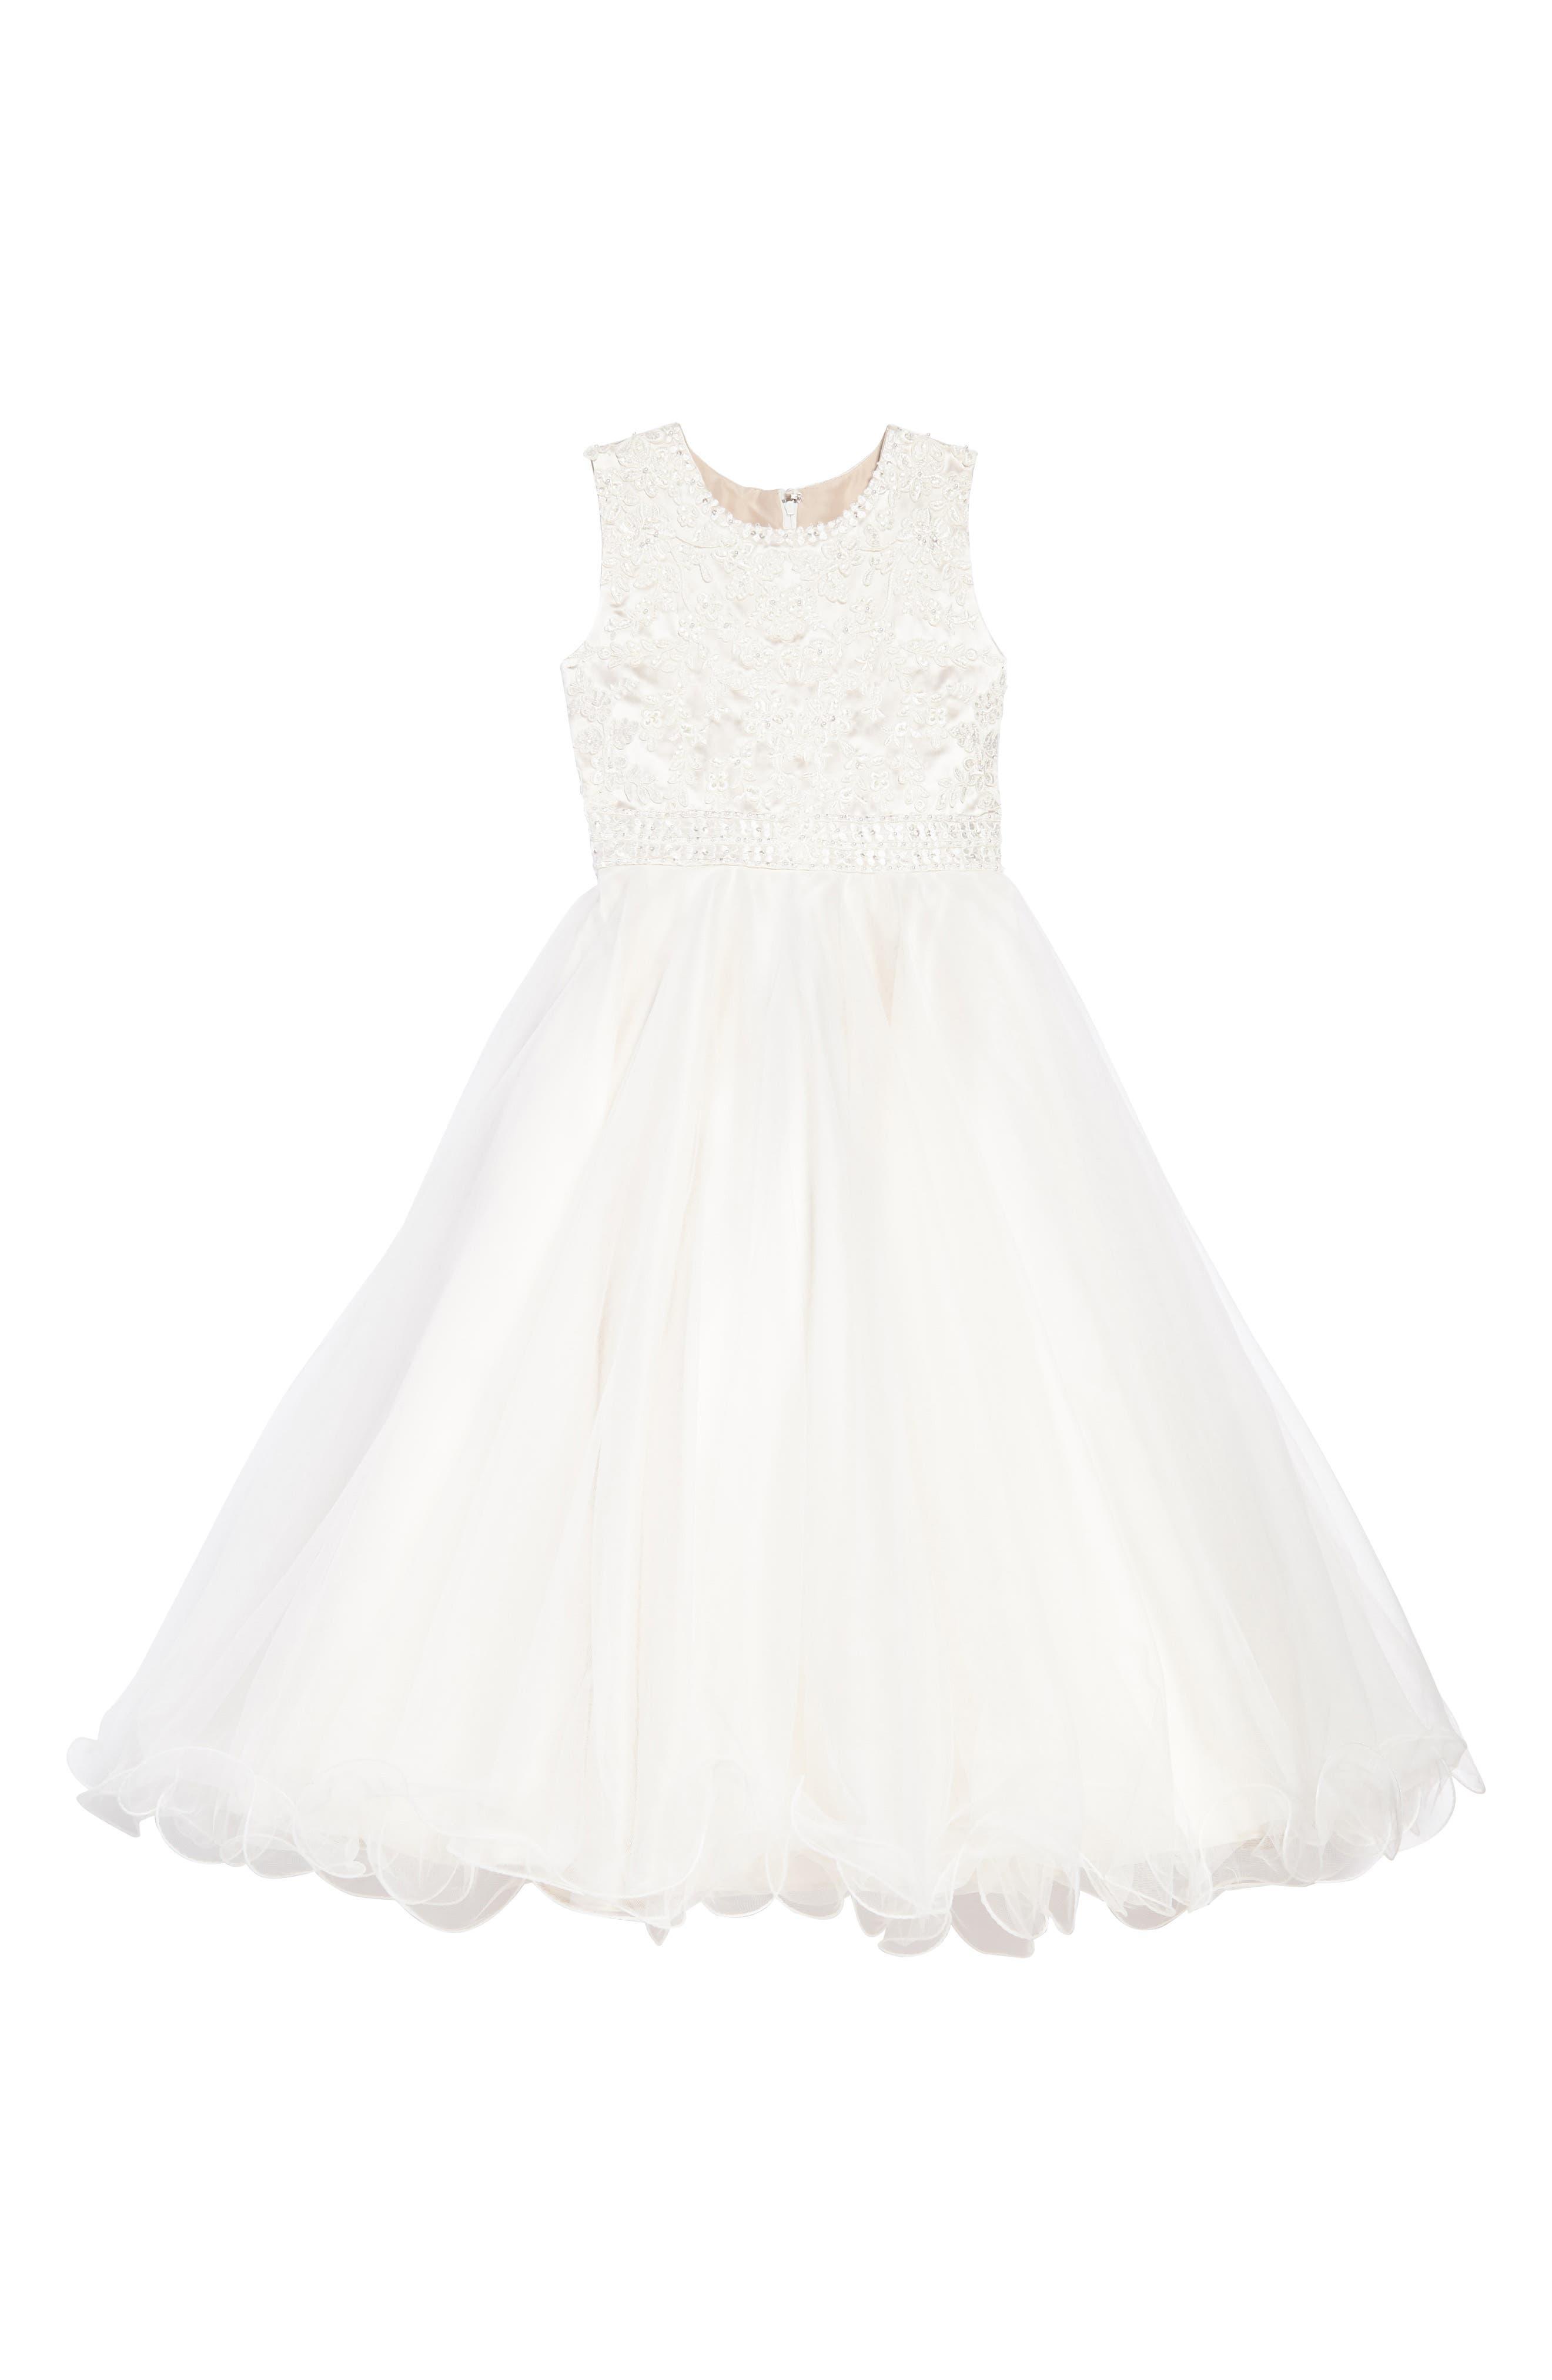 Joan Calabrese for Mon Cheri Lace & Tulle Dress (Toddler Girls, Little Girls & Big Girls)